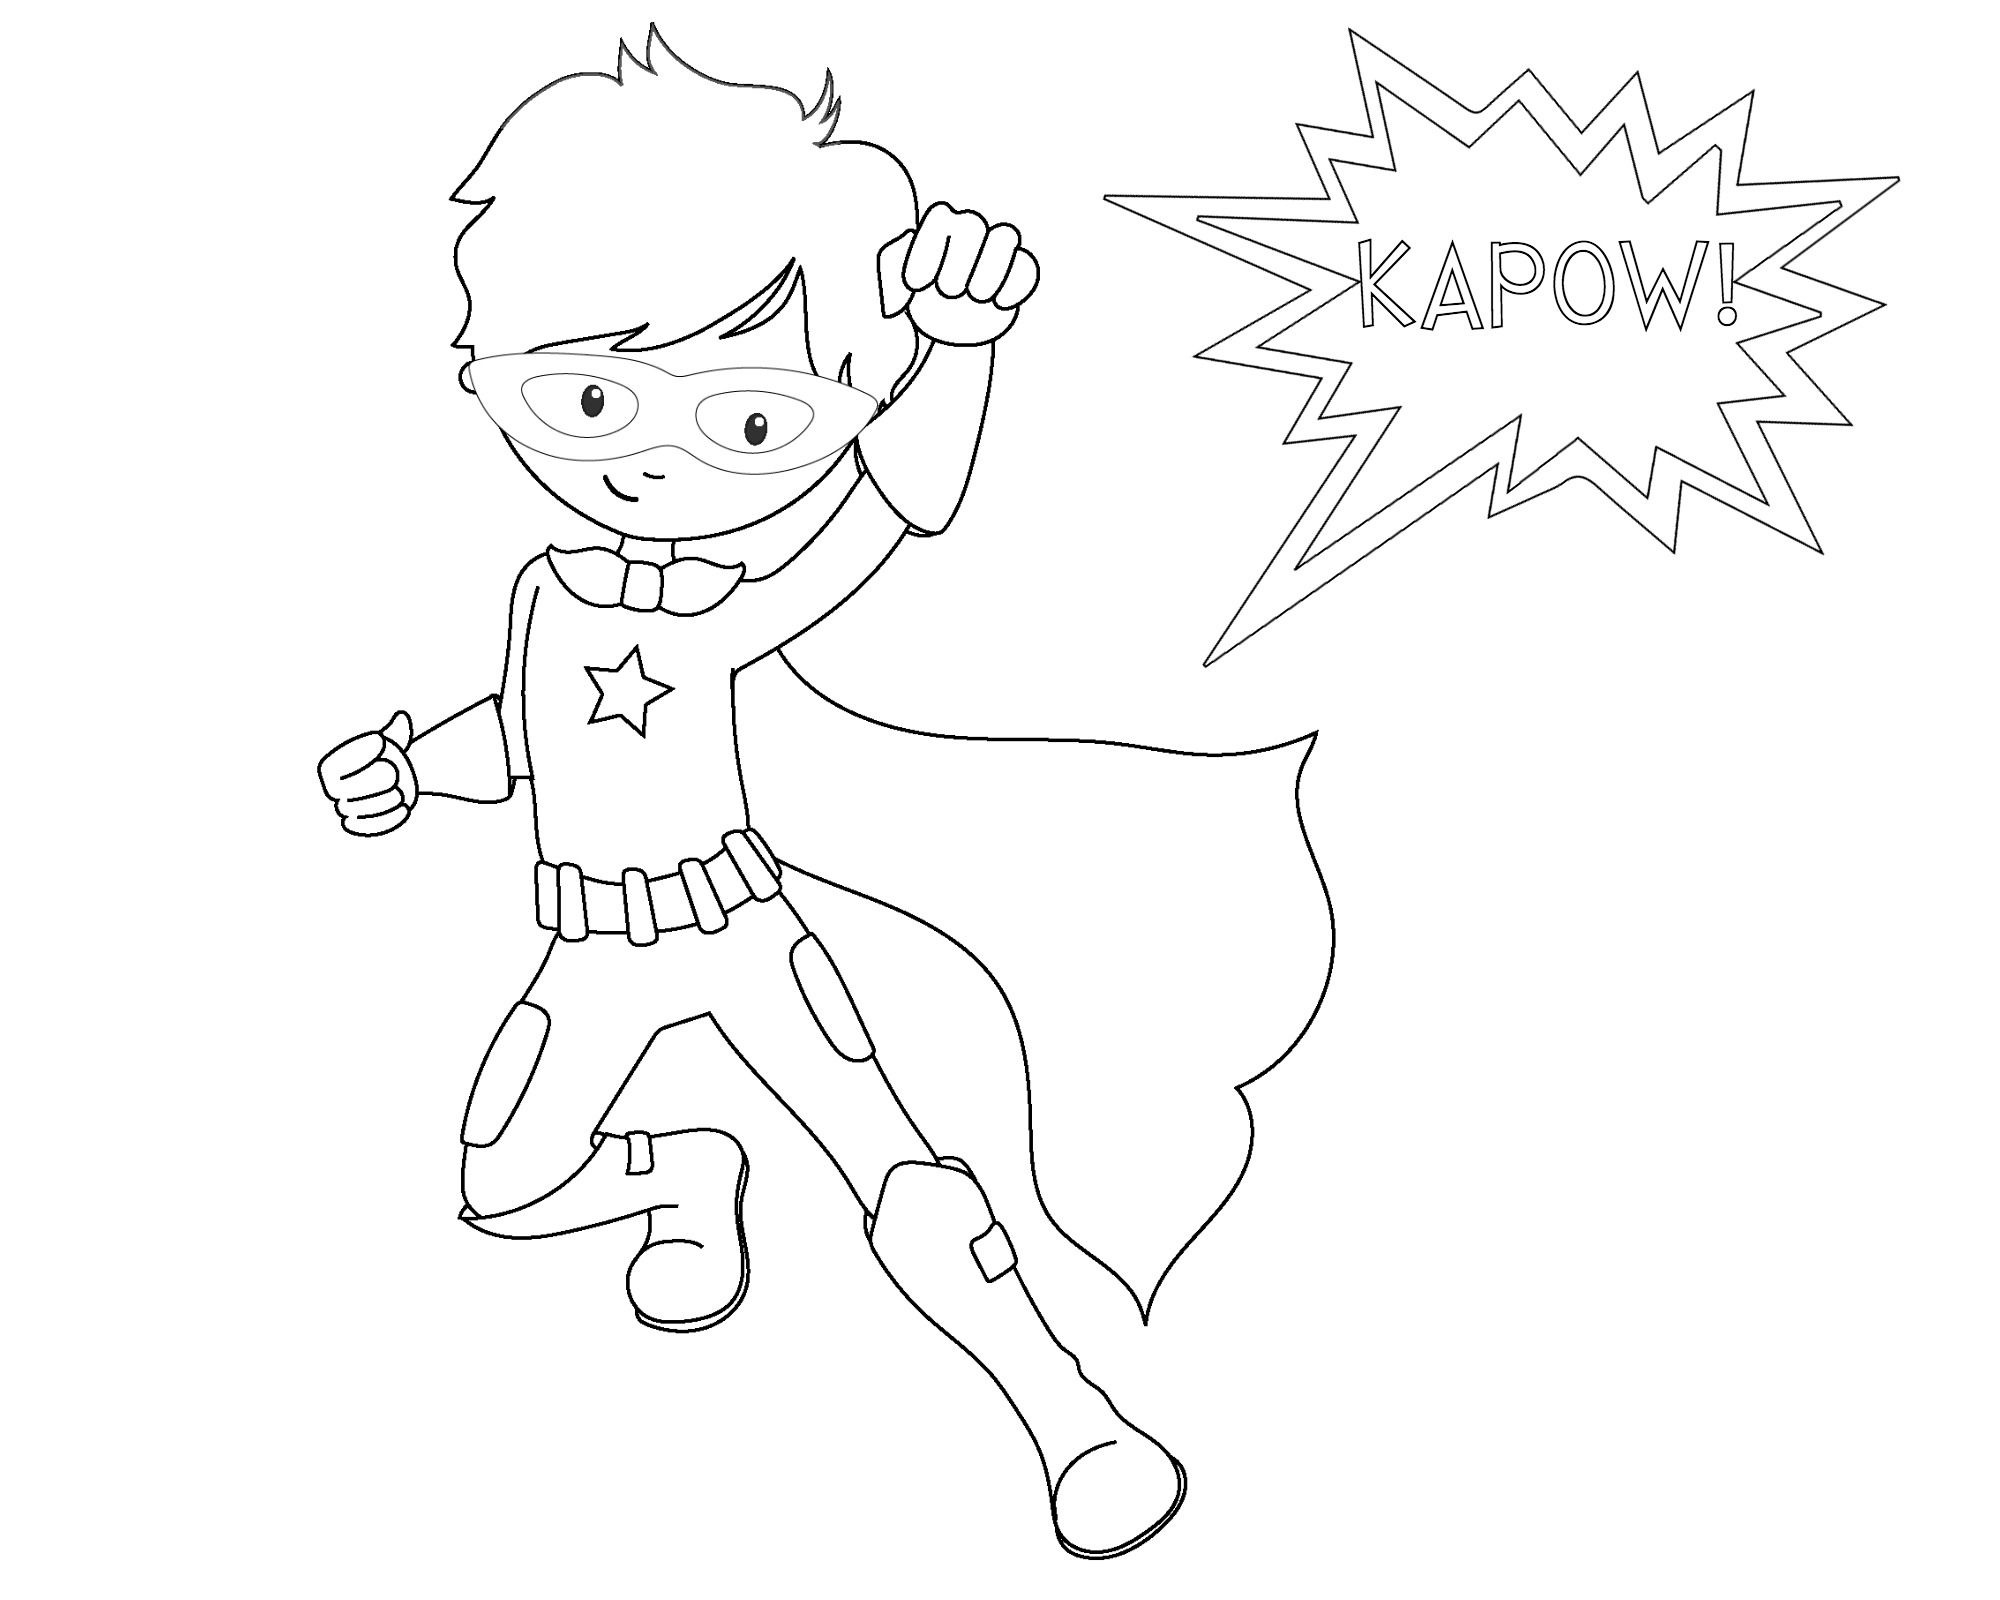 Free Printable Superhero Coloring Sheets For Kids Super Hero Coloring Sheets Superhero Coloring Pages Superhero Coloring